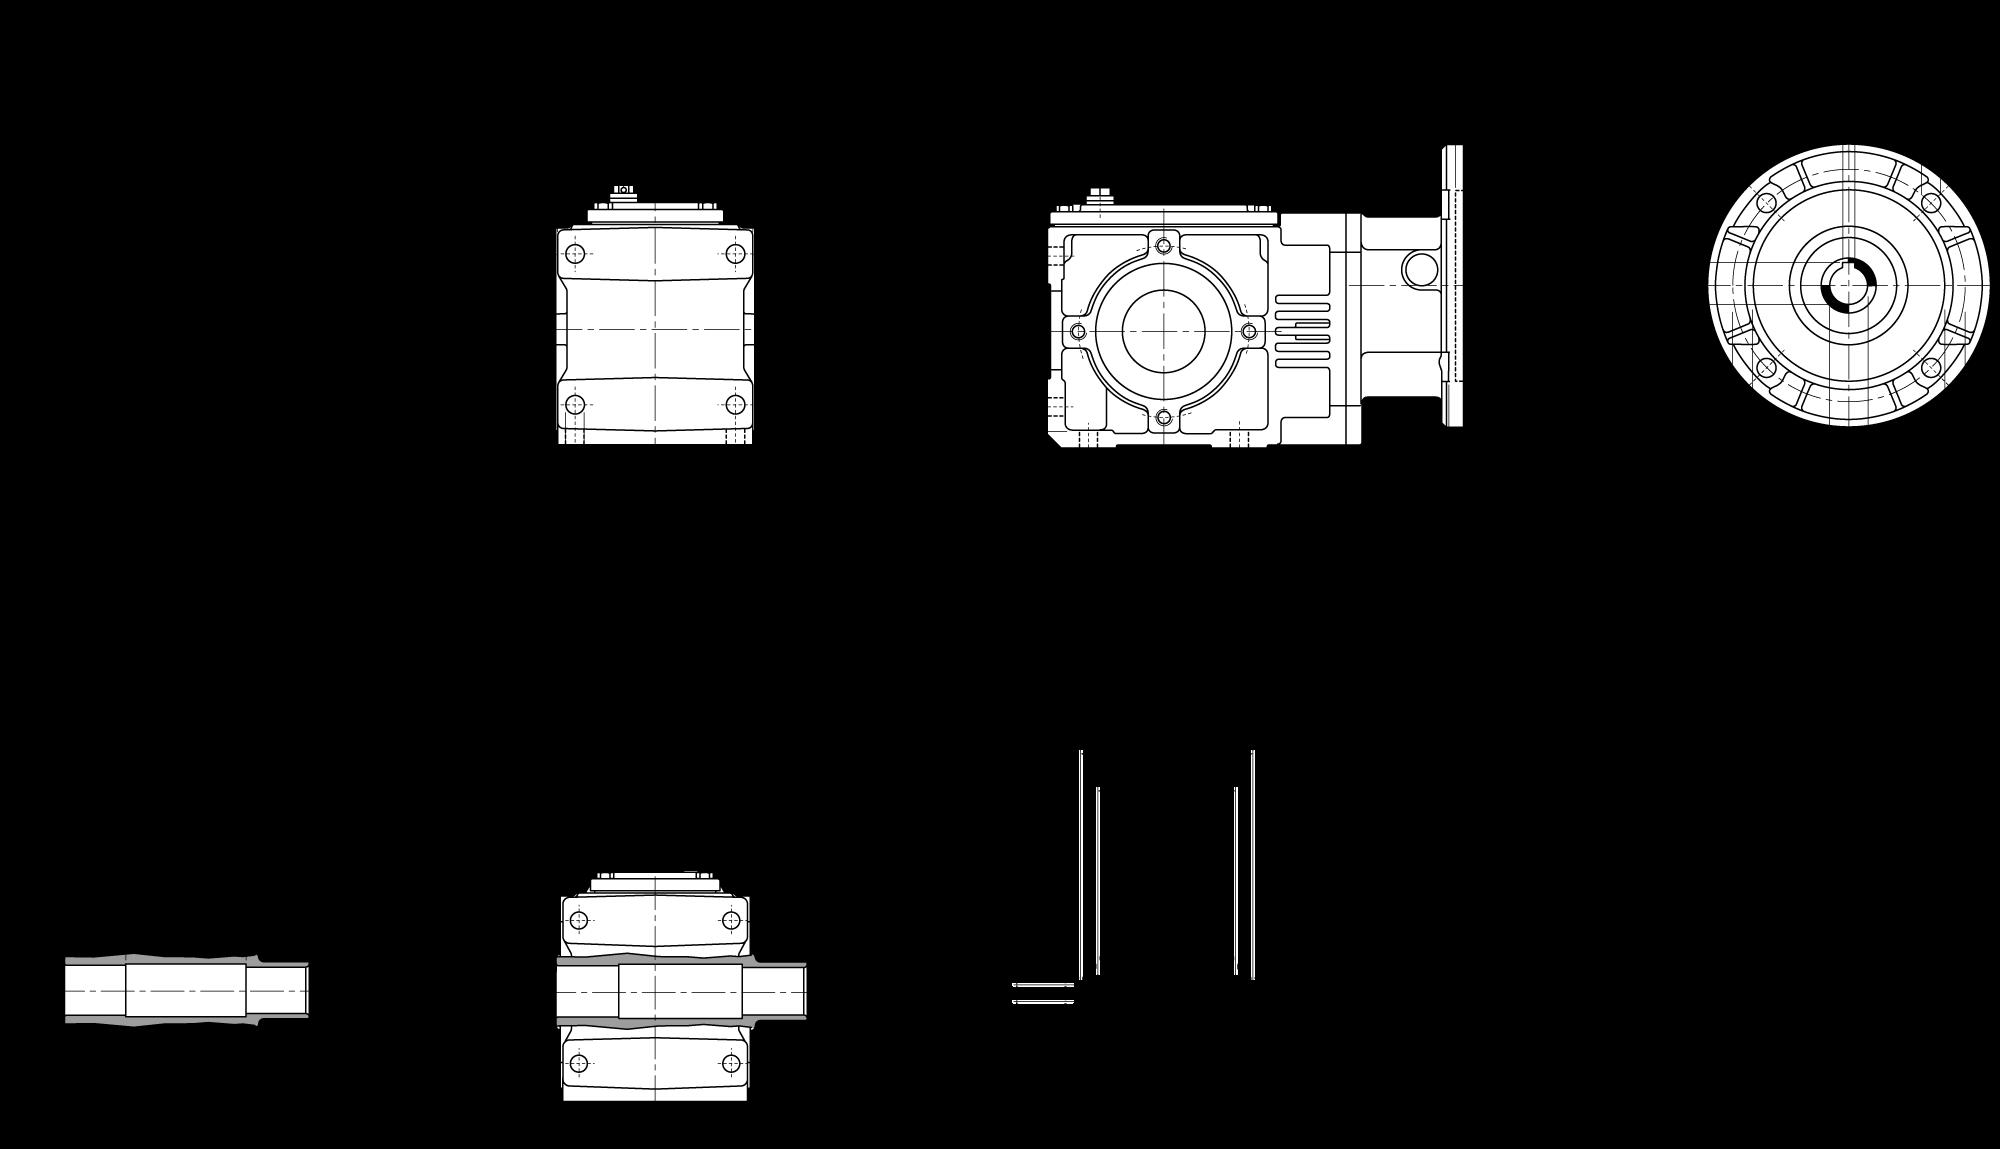 bonfiglioli motor 3 phase wiring diagram ac wiring diagram single ac wiring diagram single phase motor to control 3 a0052005504bs bonfiglioli riduttori bevel gearboxes 3 phase 6 wire motor wiring diagram dimension drawing bonfiglioli riduttori